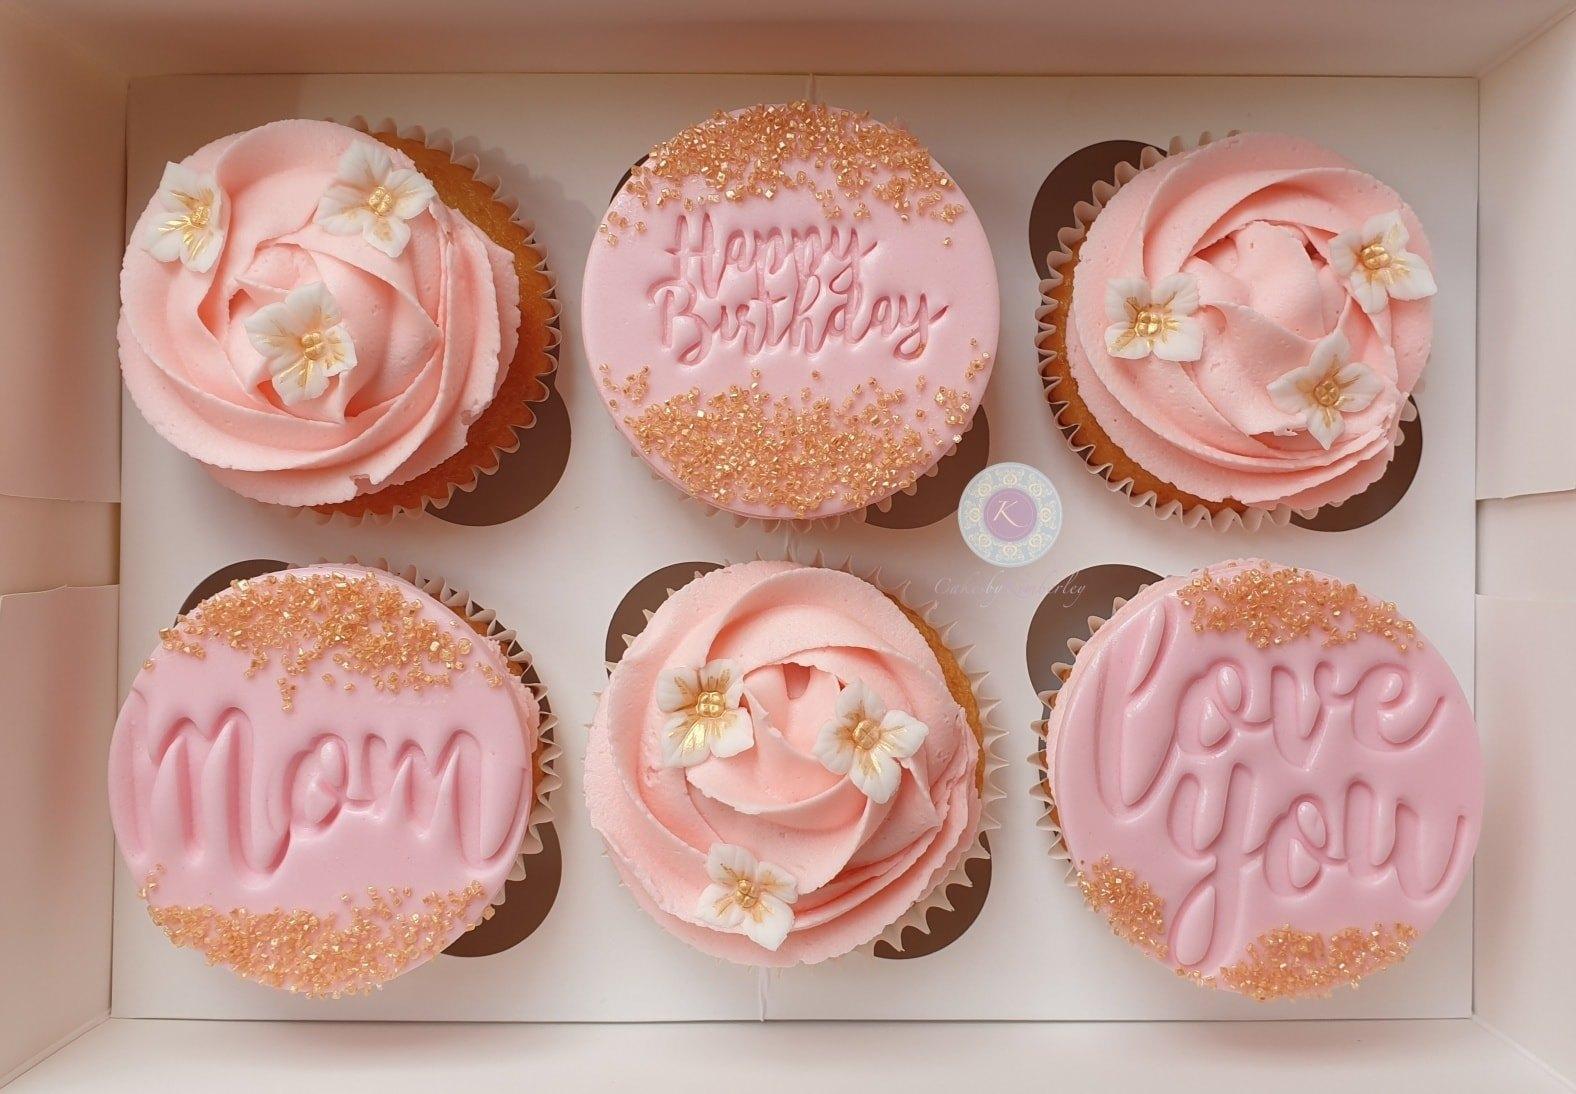 Cupcakes - Mum love you